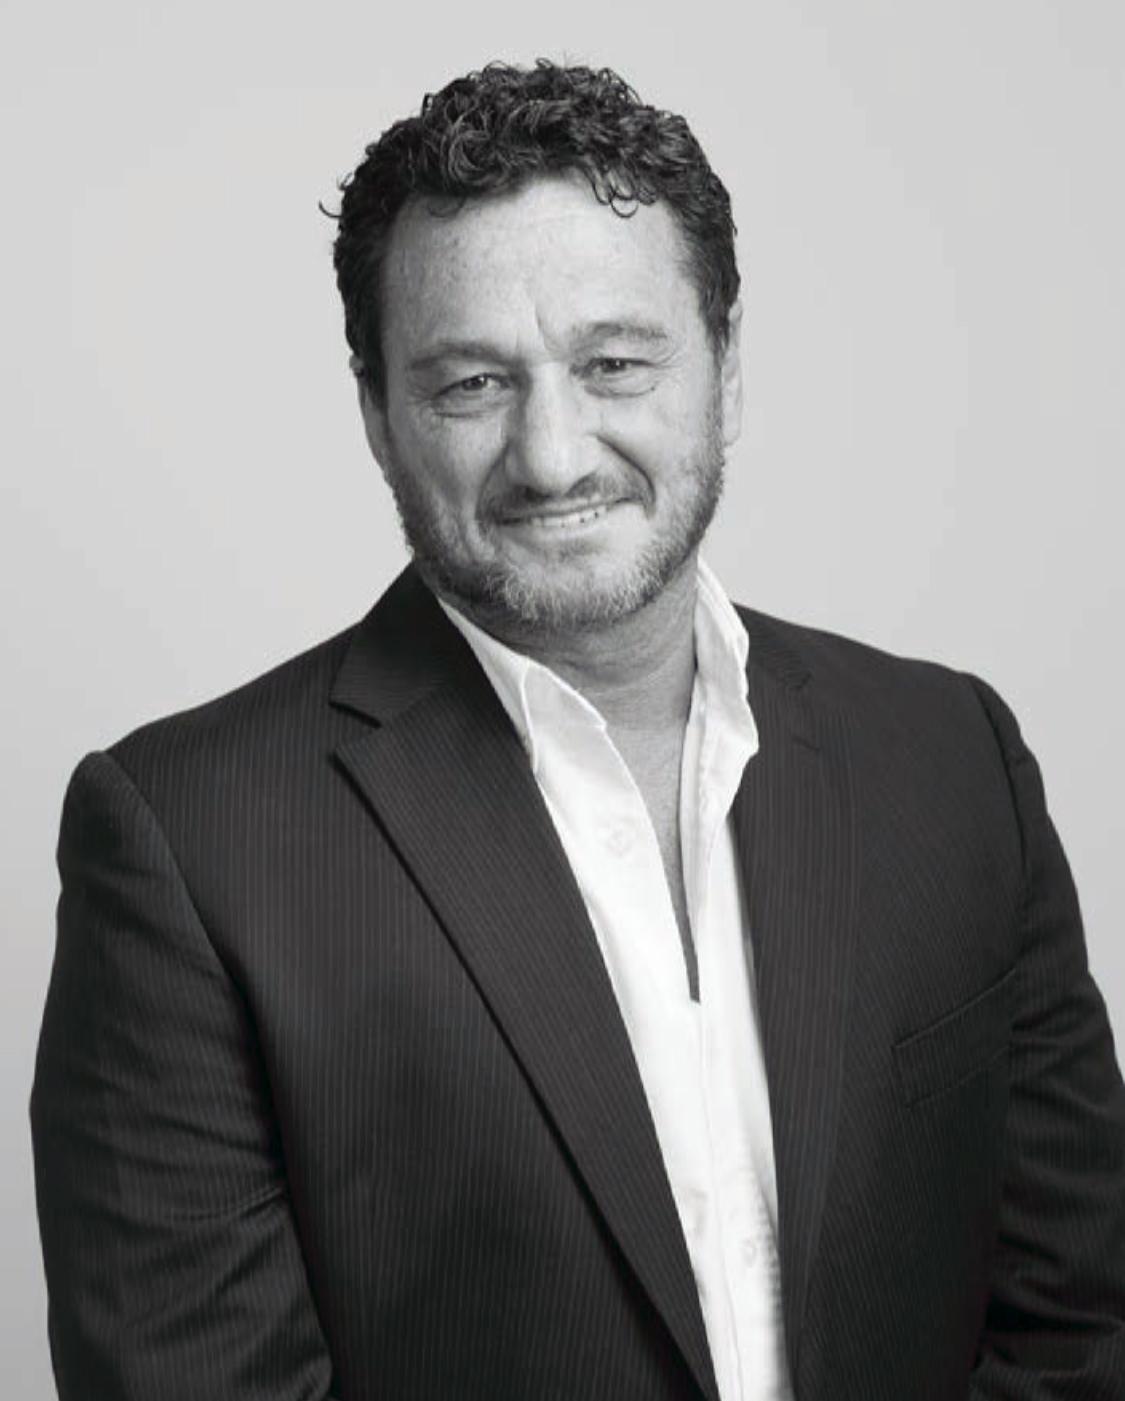 Sebastian Zysman